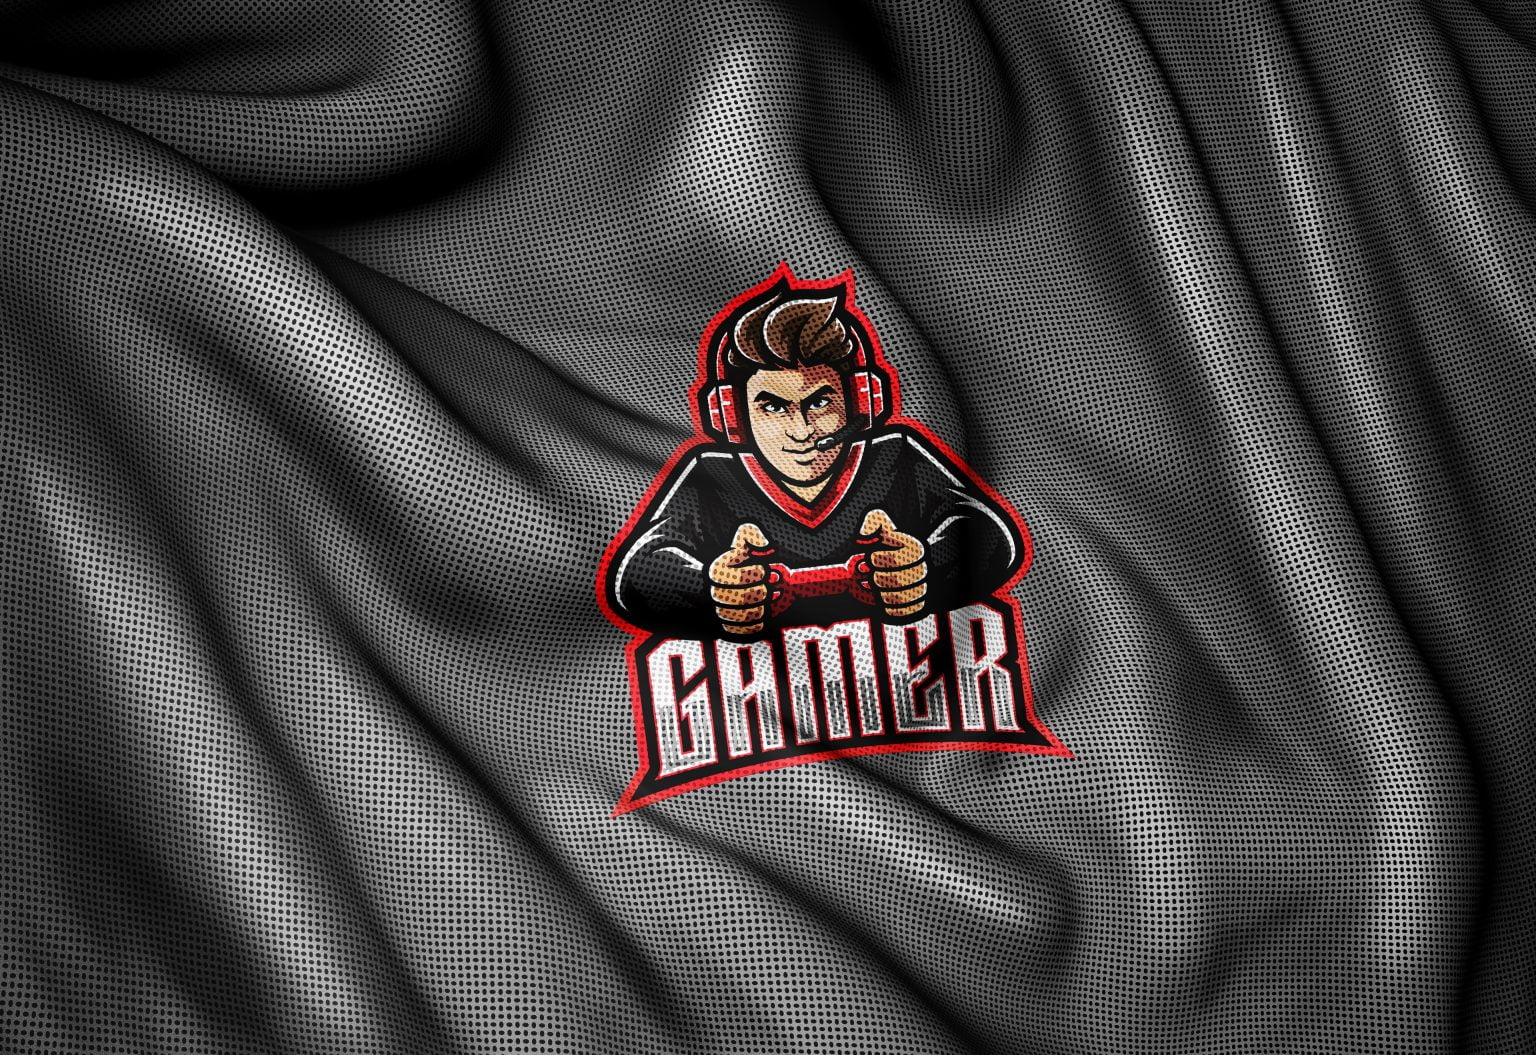 Sports Jersey Fabric Texture Photoshop Logo Mockup